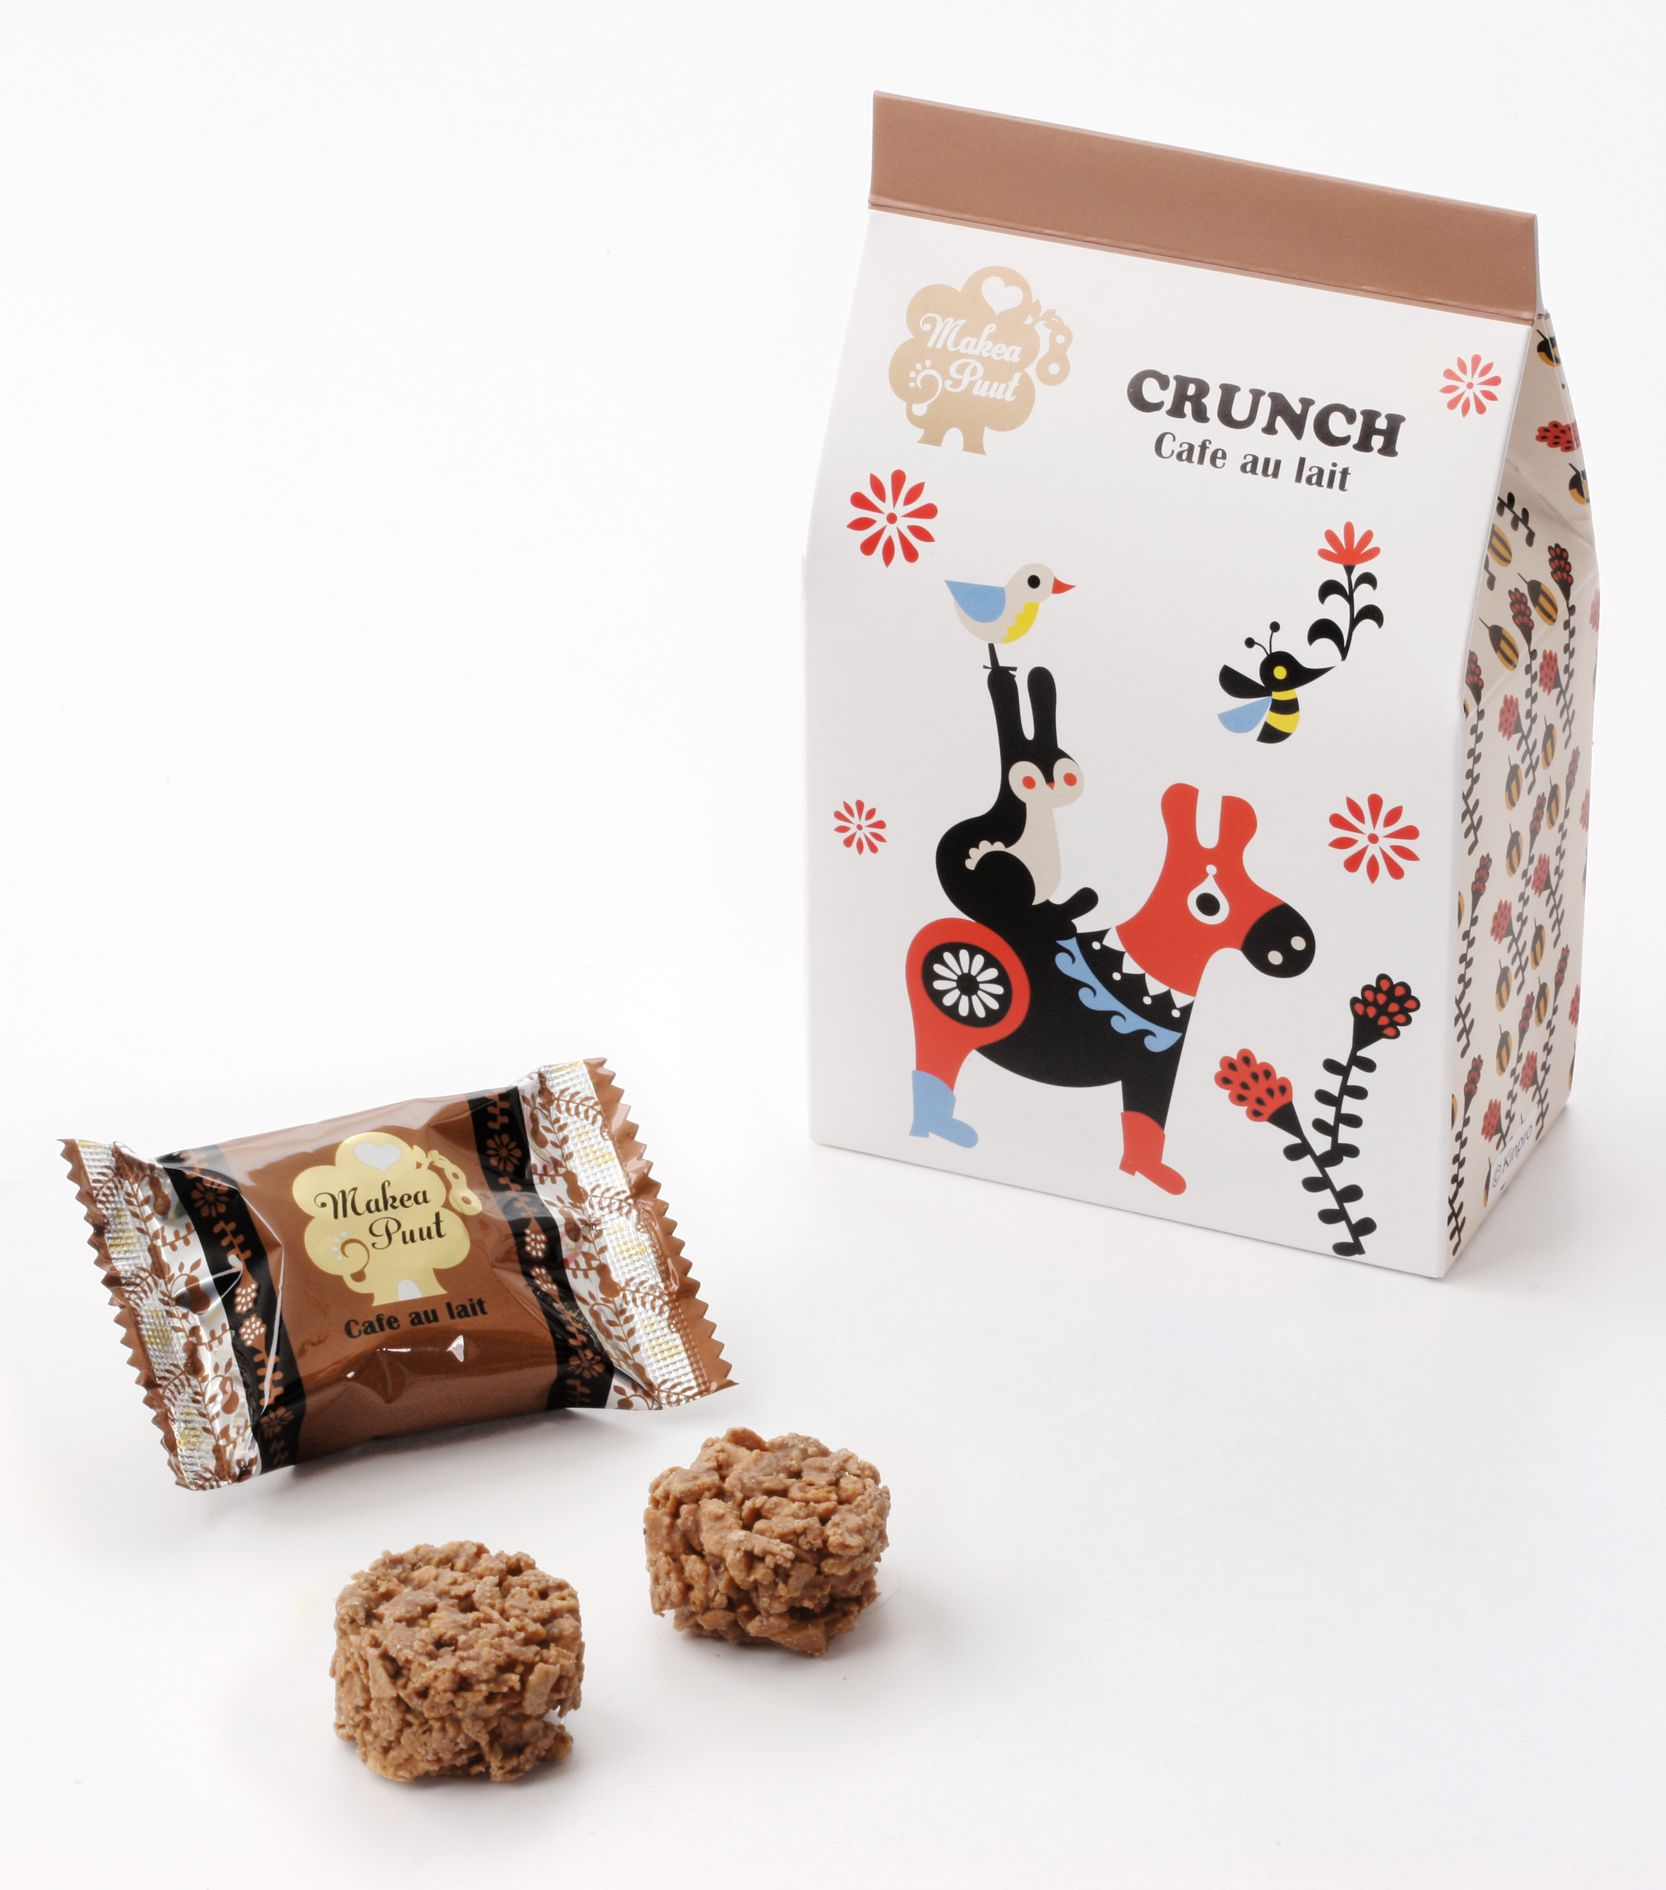 [Makea Puut][Crunch] (by Kinpro) PD